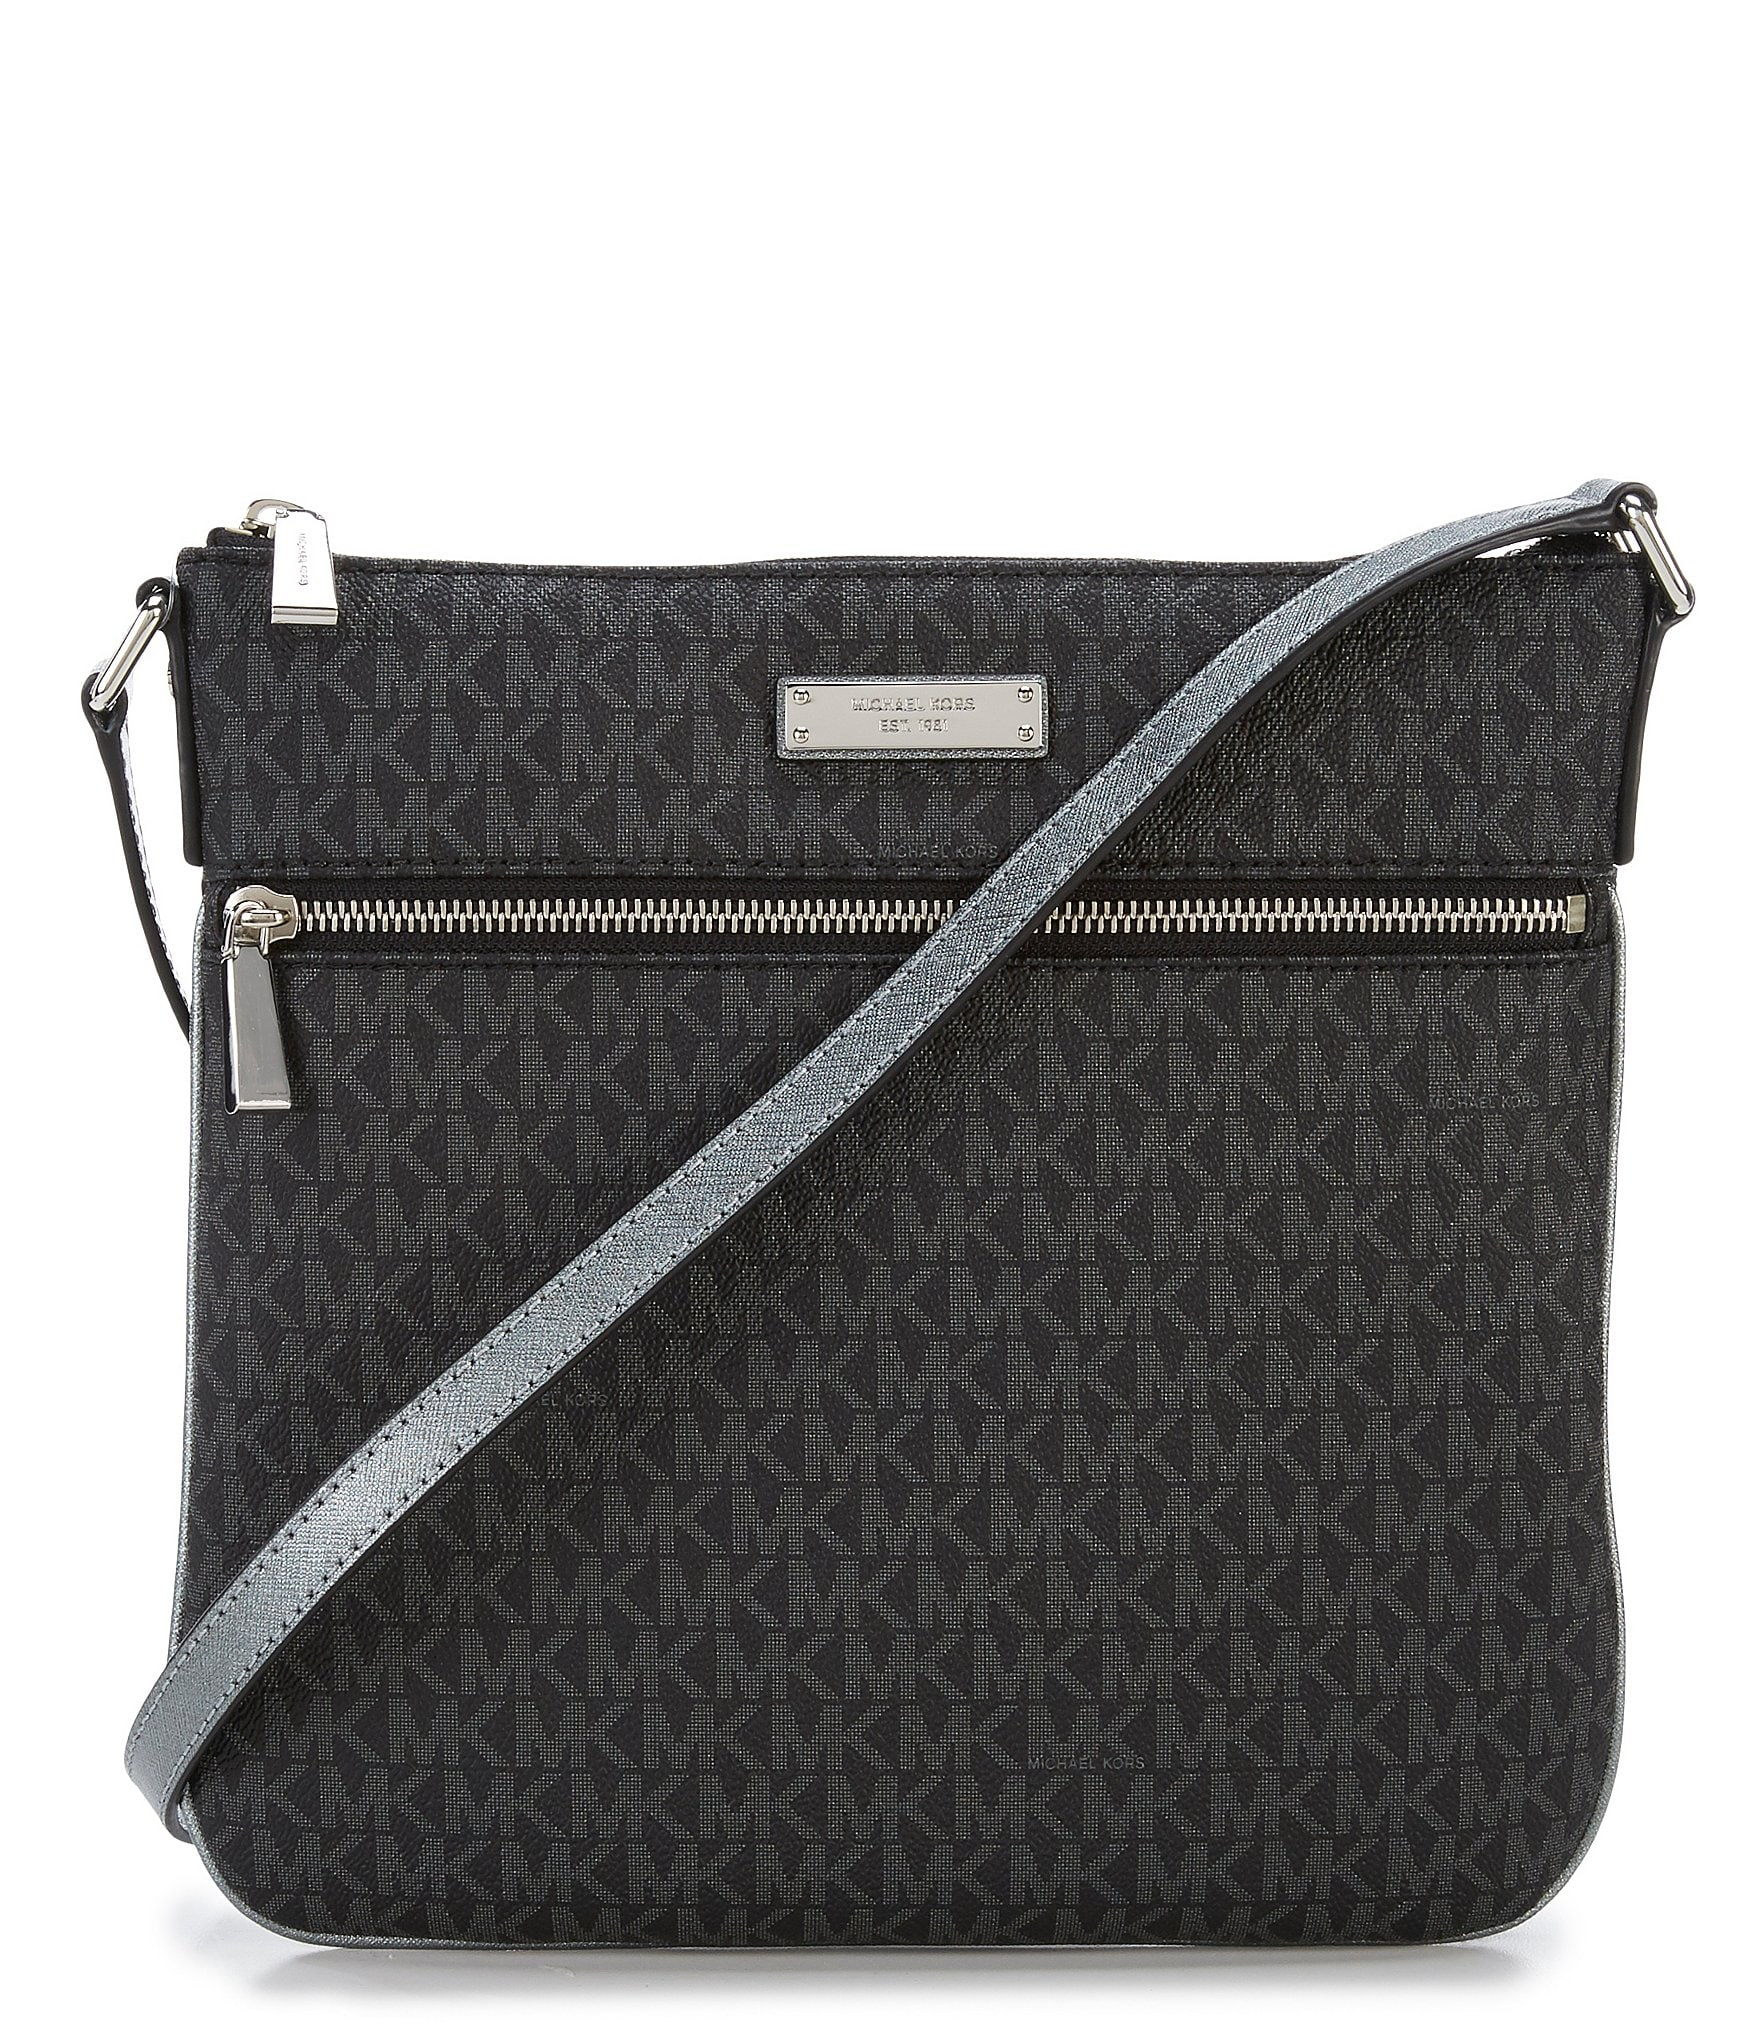 dillards michael kors purses on sale michael kors purses white and brown